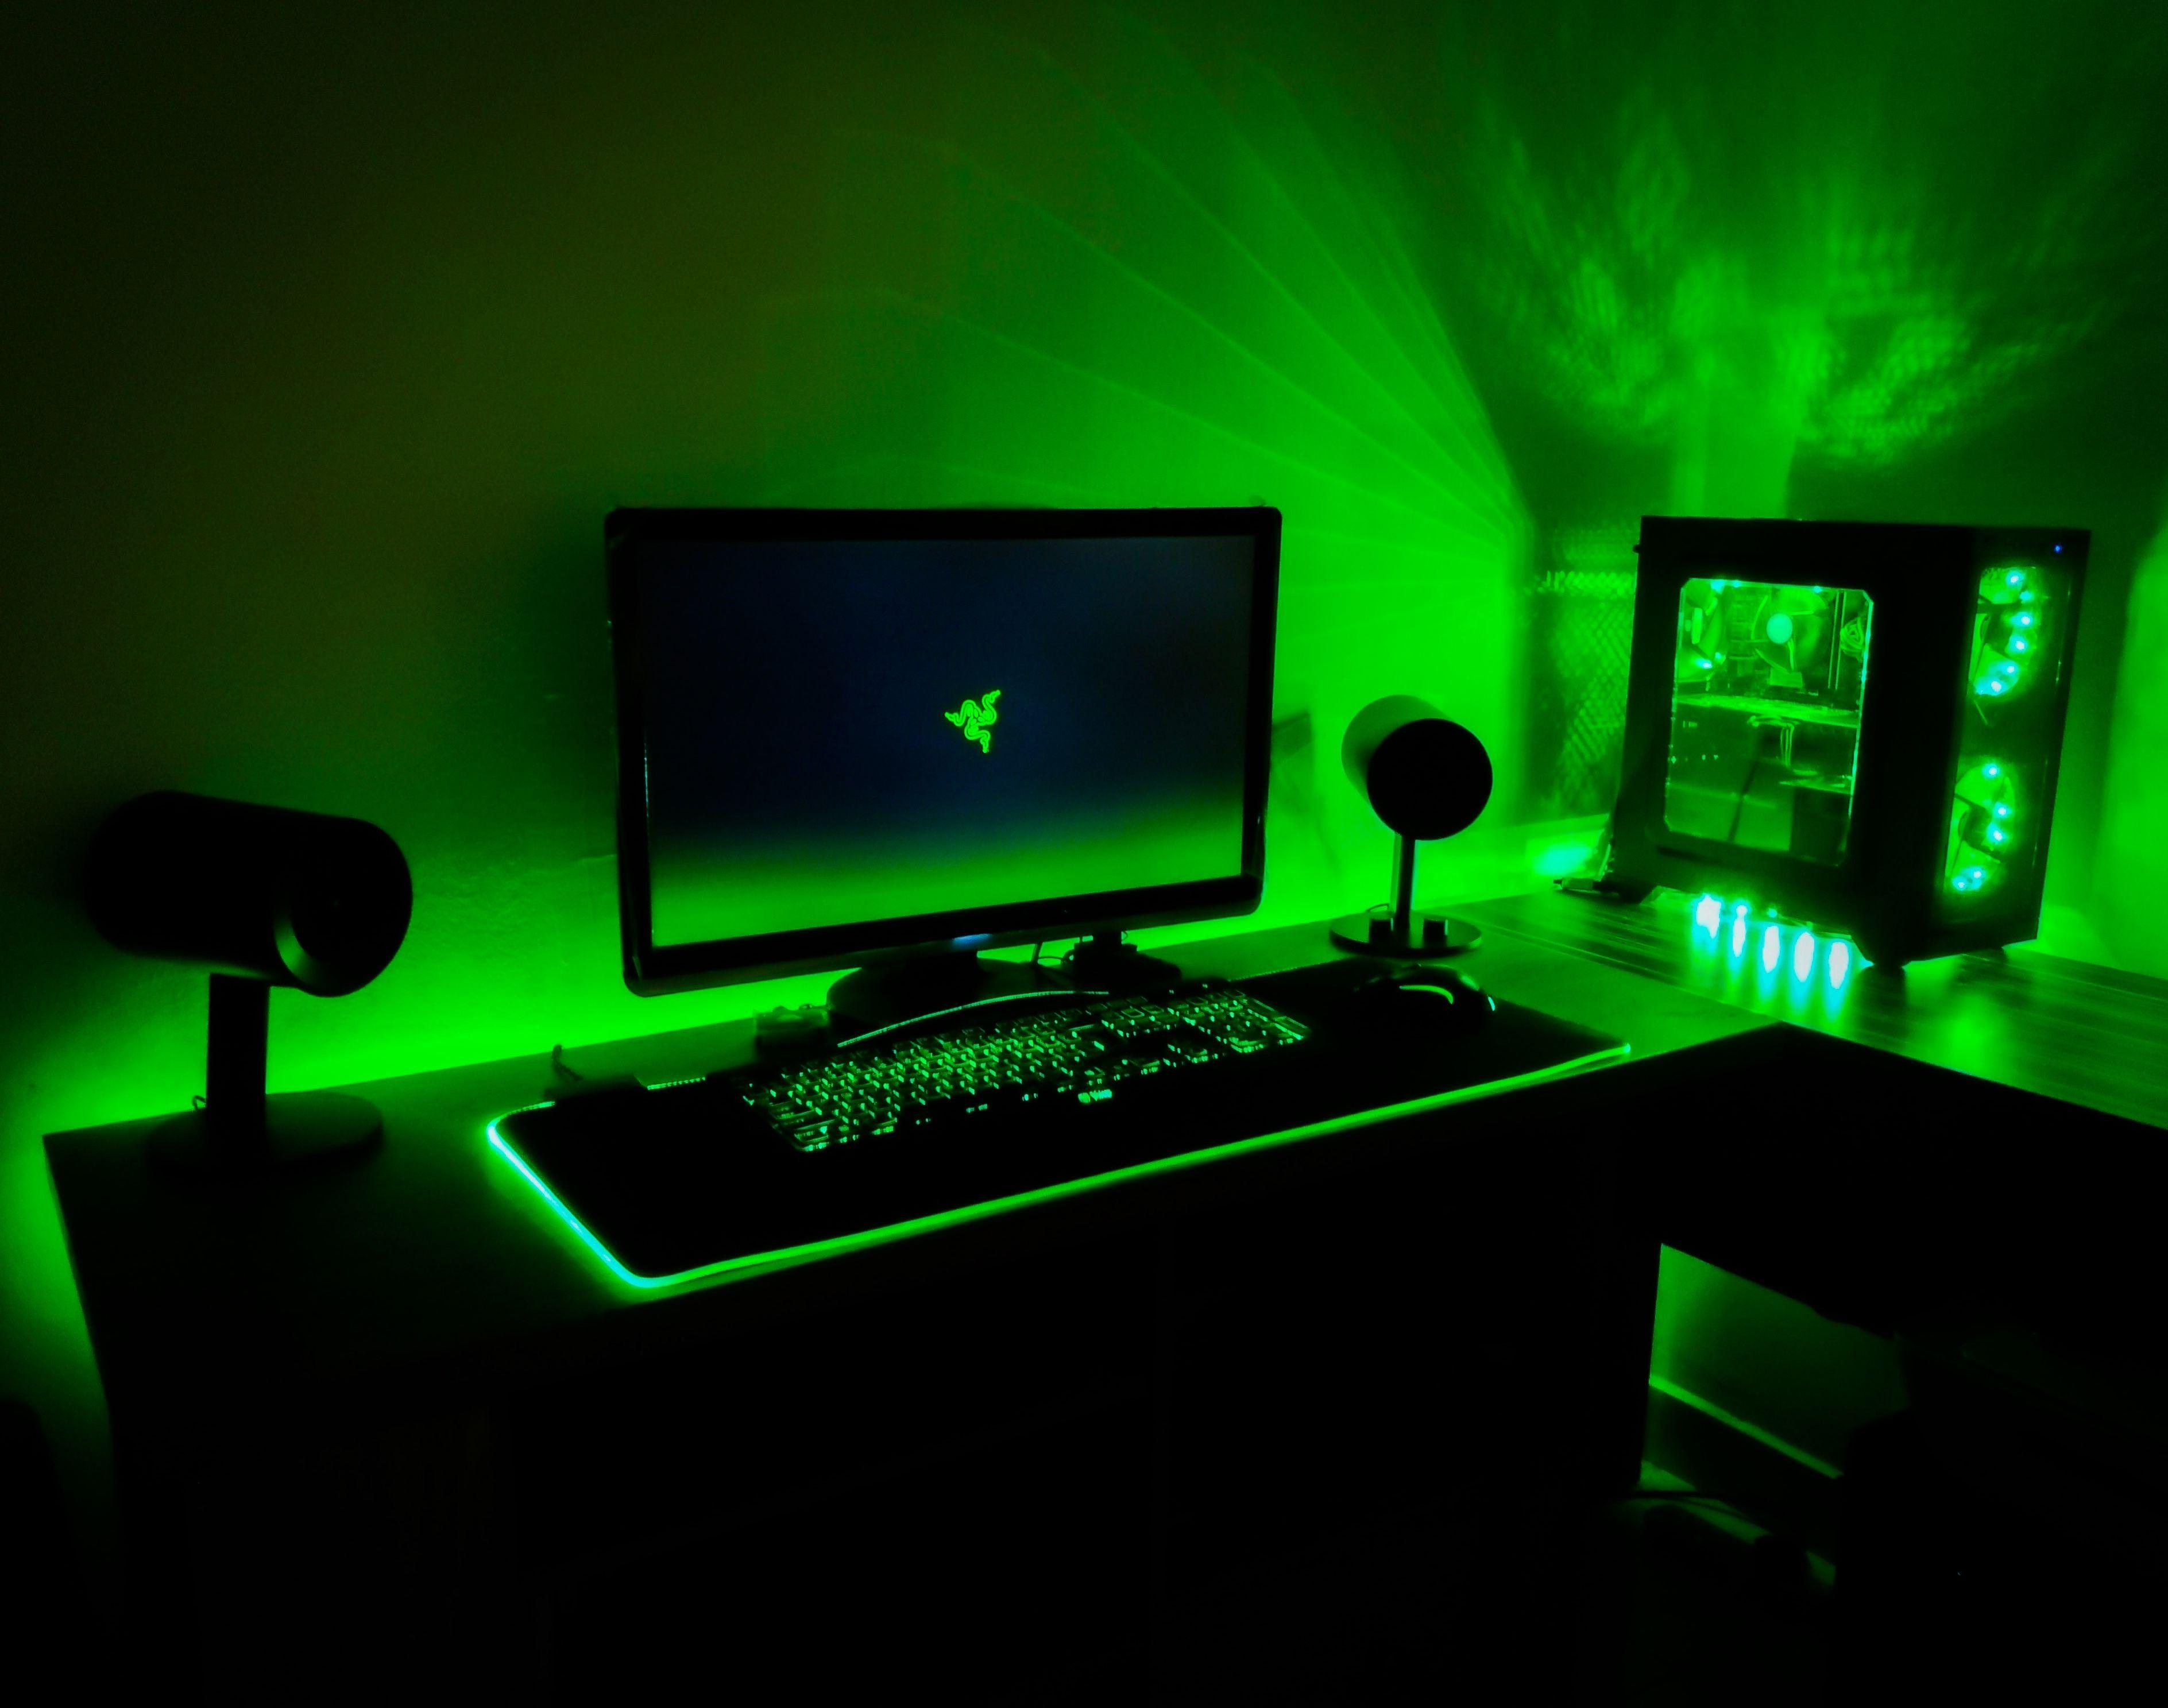 Budget Gaming Razer Desk Setup Gaming Room Setup Cheap Gaming Setup Video Game Rooms